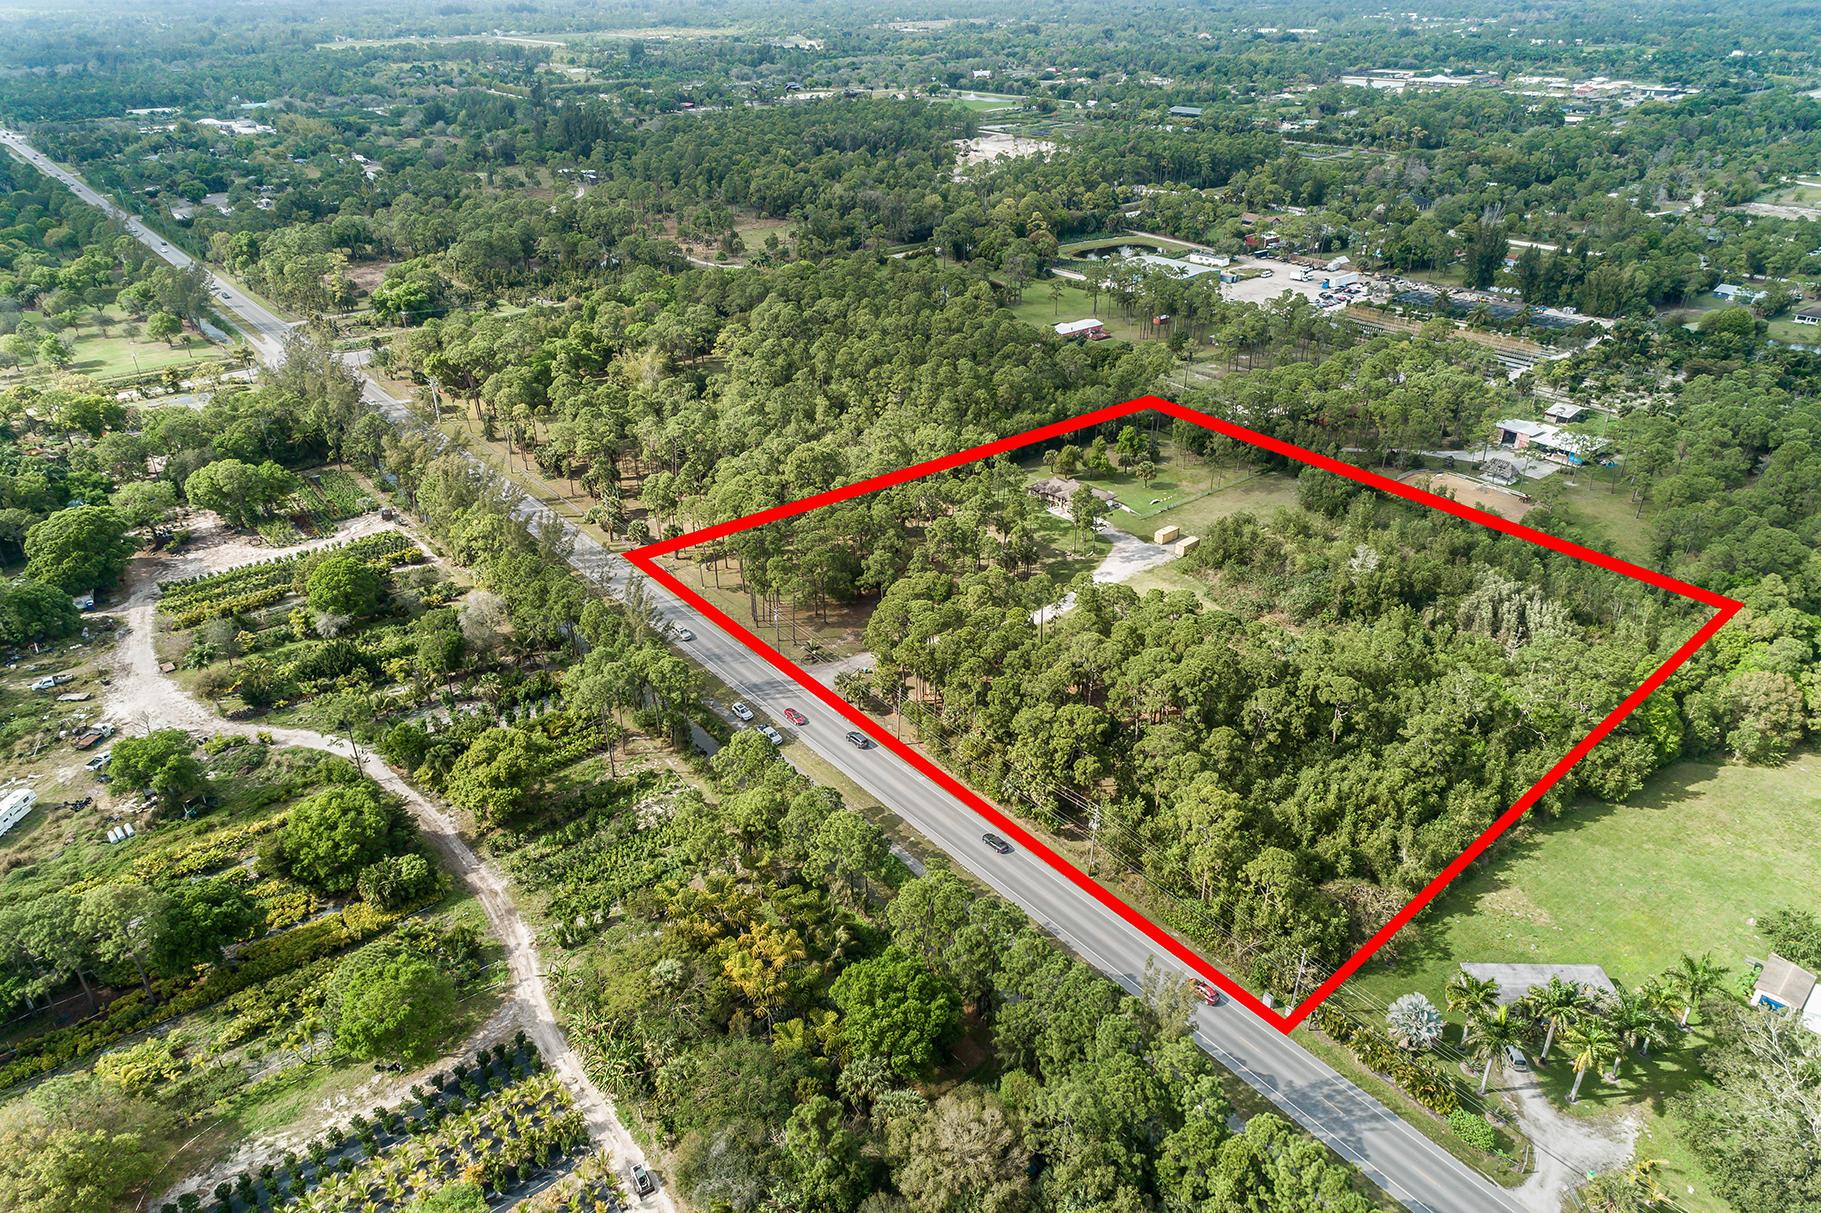 Details for 14805 Okeechobee Boulevard, Loxahatchee Groves, FL 33470